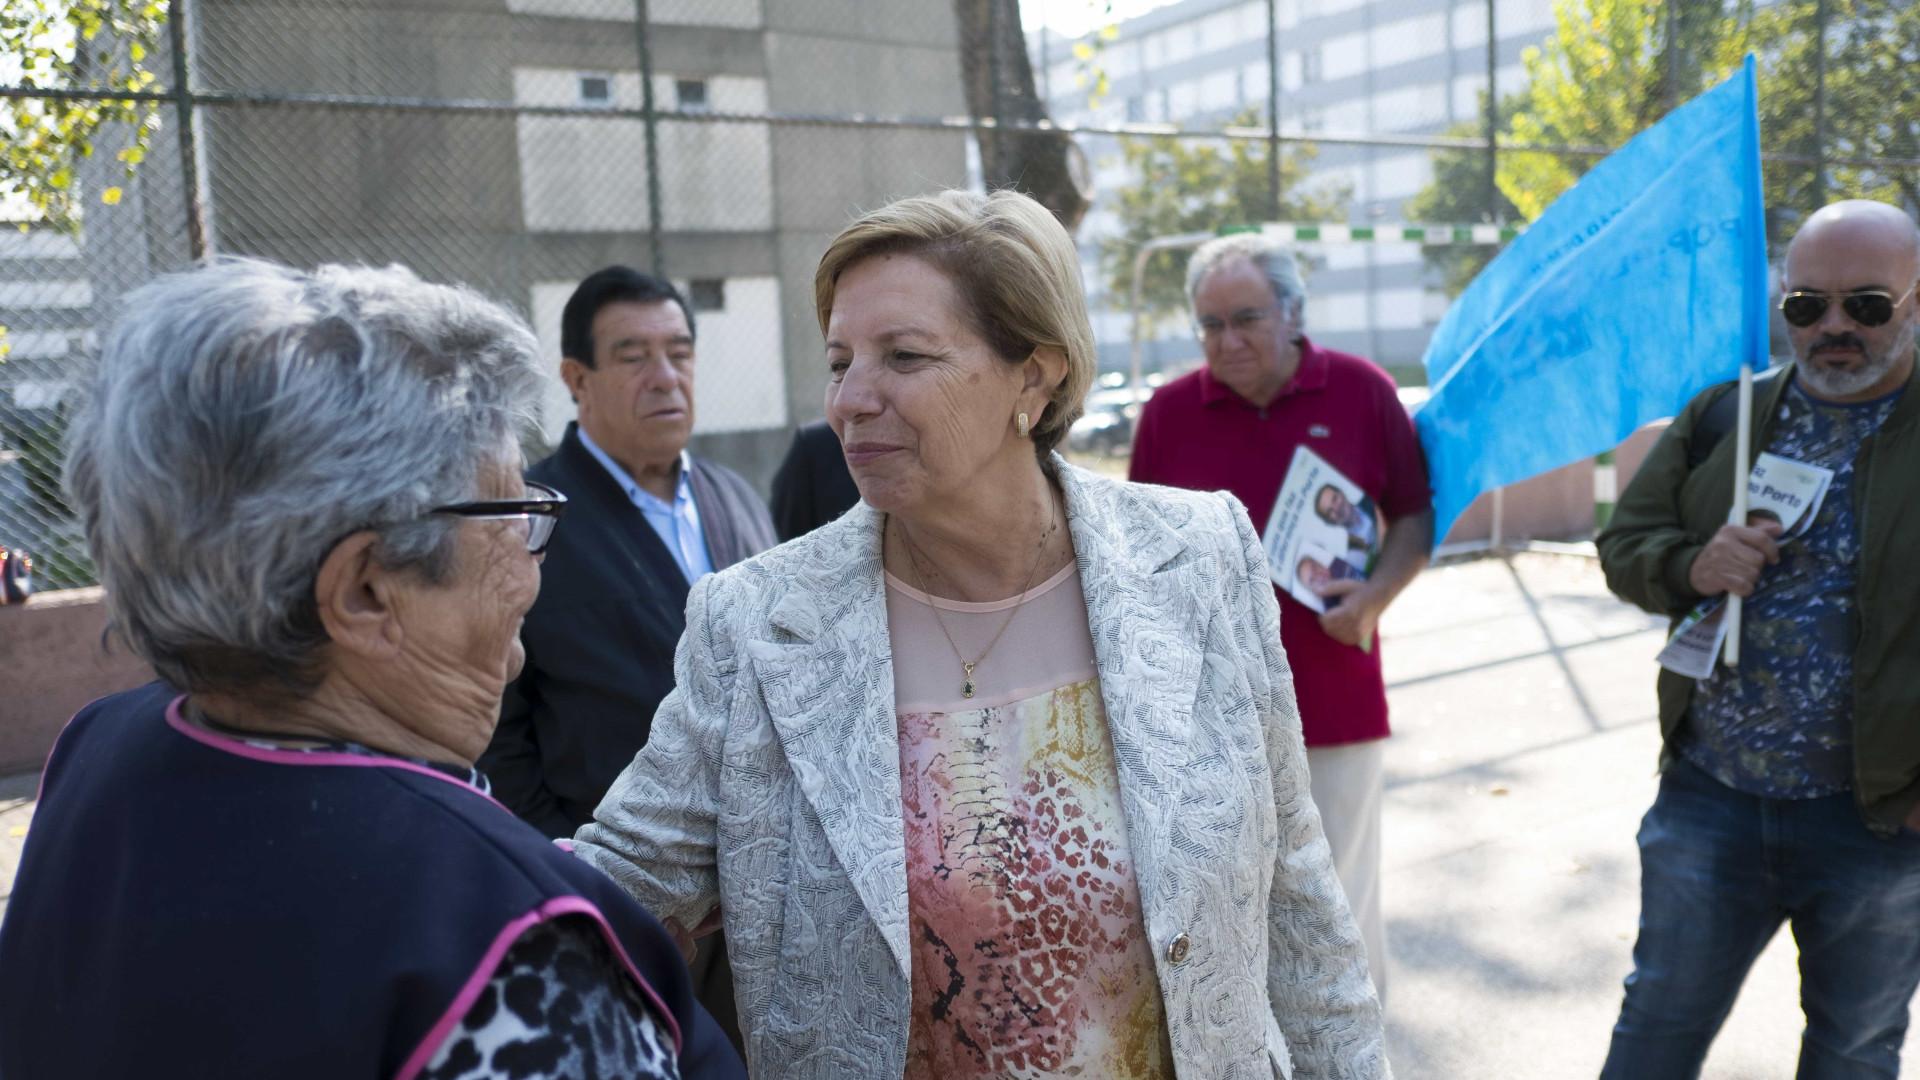 Ilda Figueiredo junta autarcas dos últimos 35 anos para debater Viana